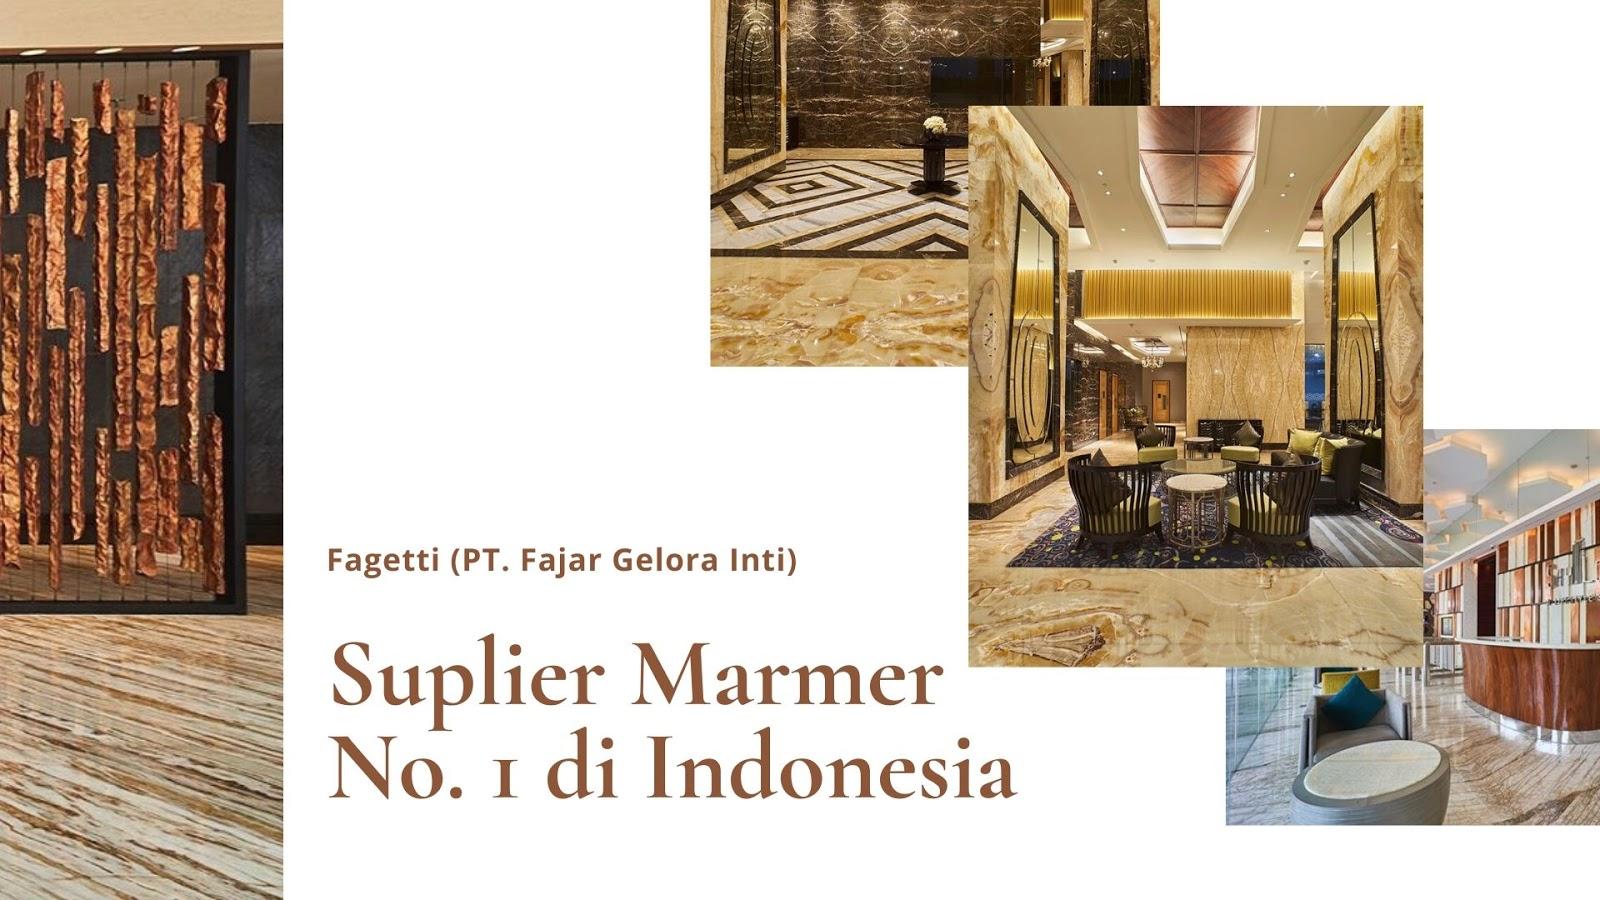 suplier marmer no 1 di indonesia